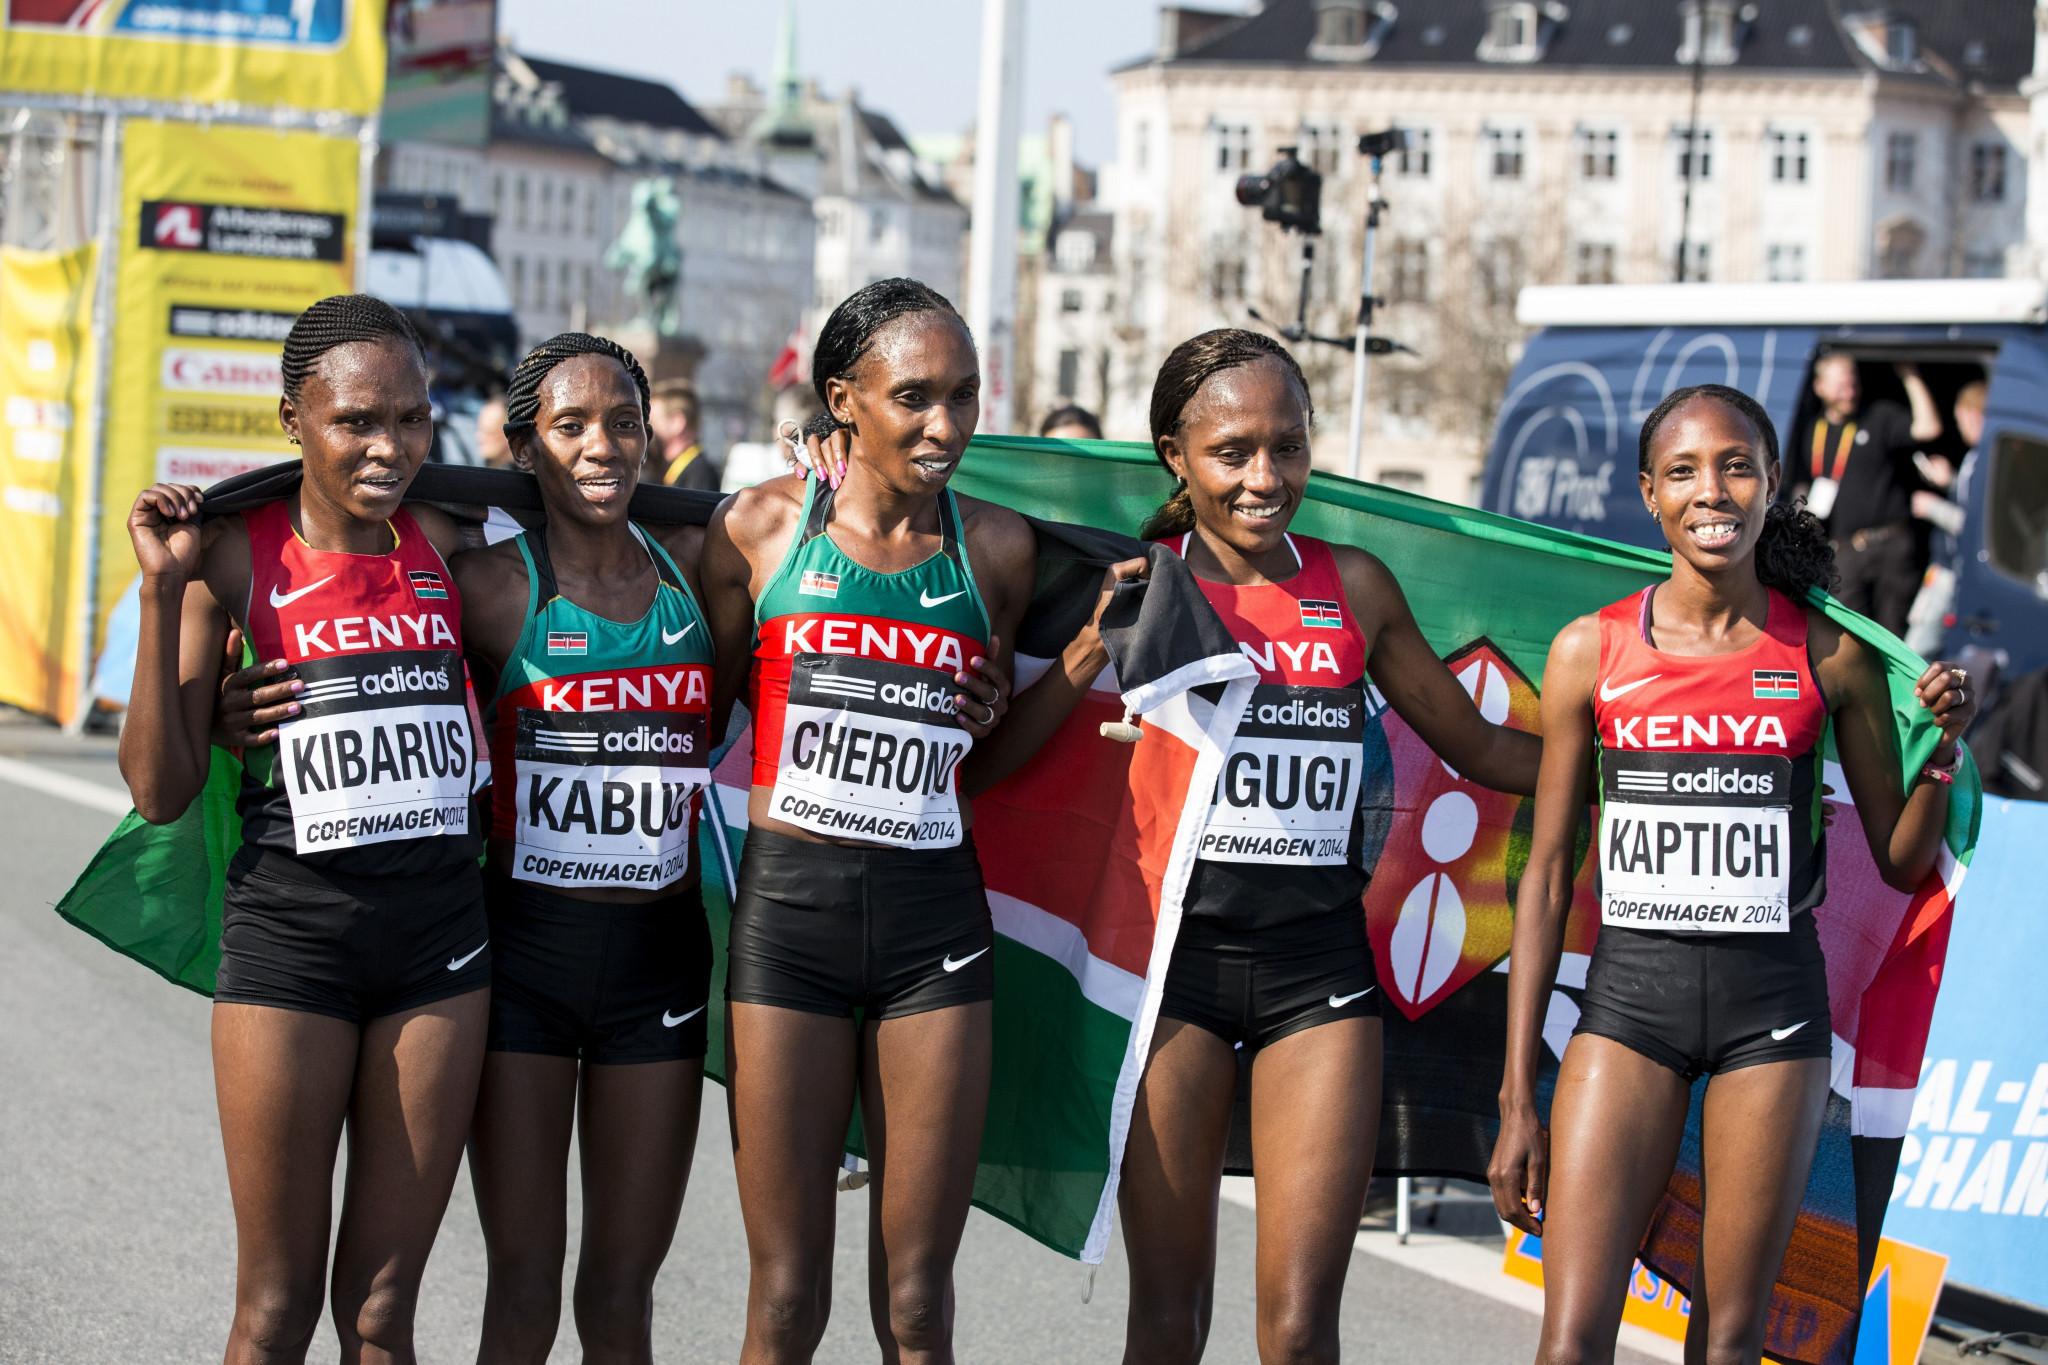 Mercy Jerotich Kibarus, left, had been part of Kenya's team that won the gold medals at the 2014 IAAF World Half Marathon Championships in Copenhagen ©Getty Images